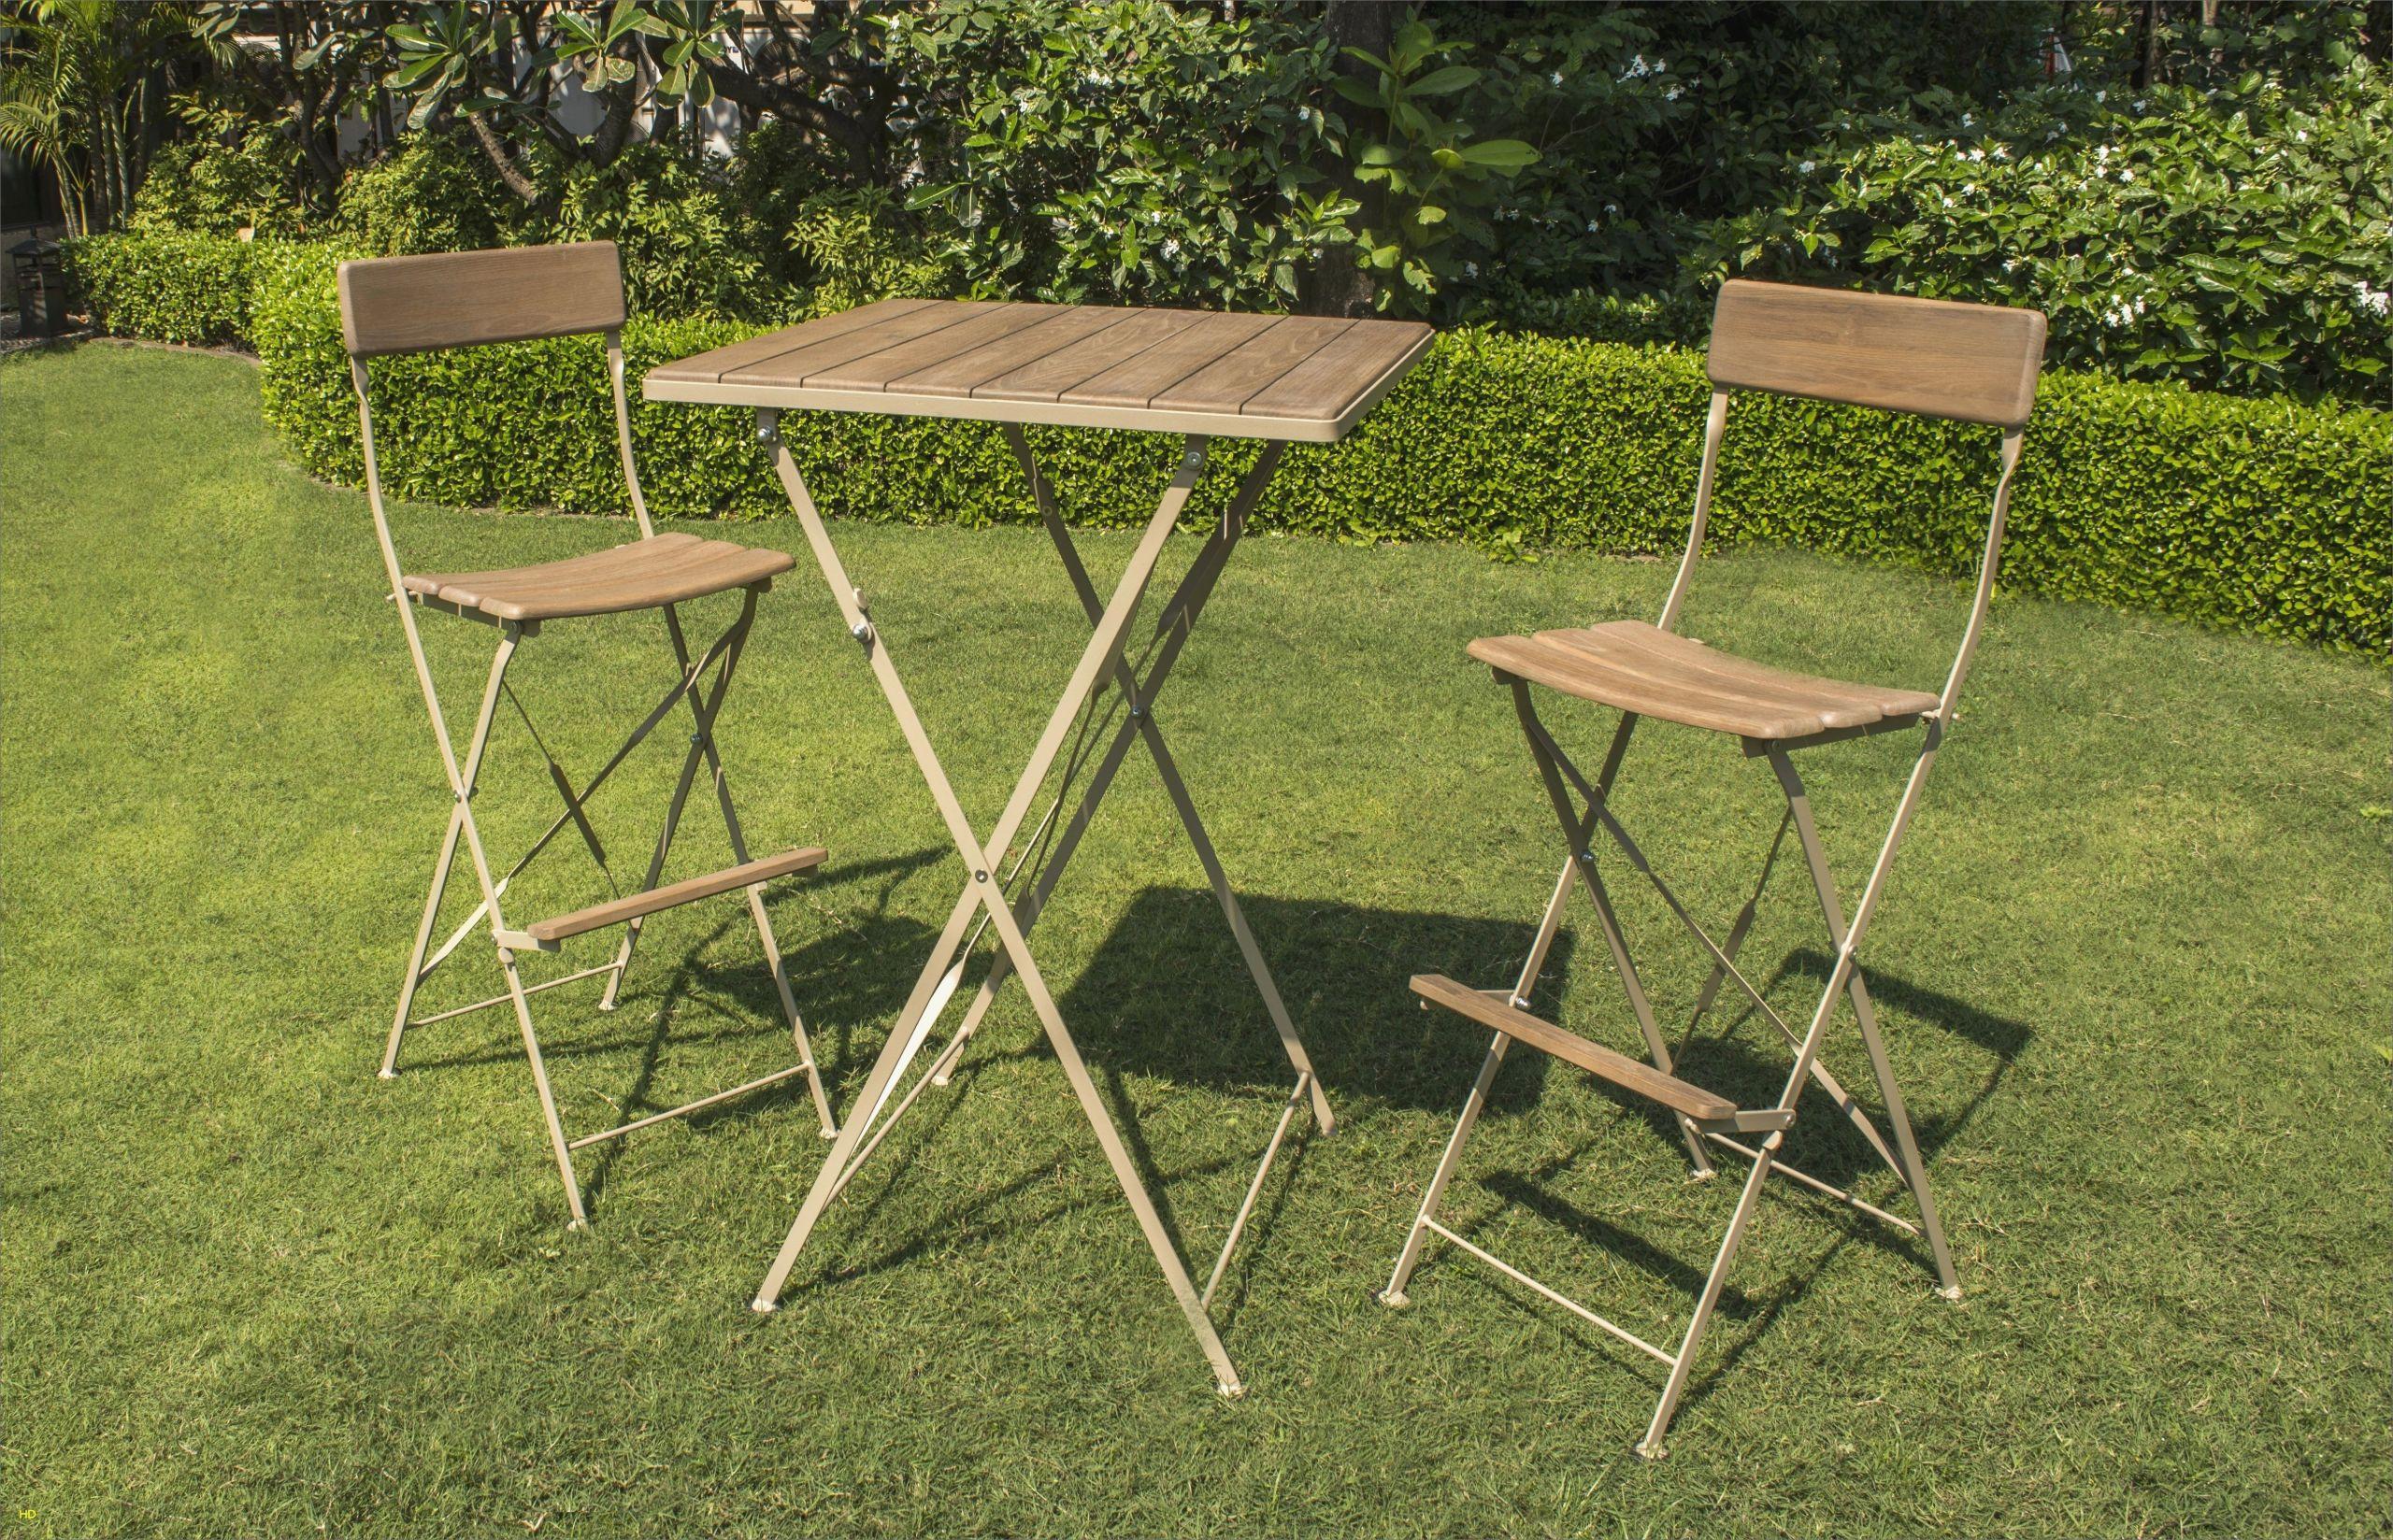 meuble pour terrasse meuble pour terrasse meuble bar pour salon inspirational meuble bar of meuble pour terrasse